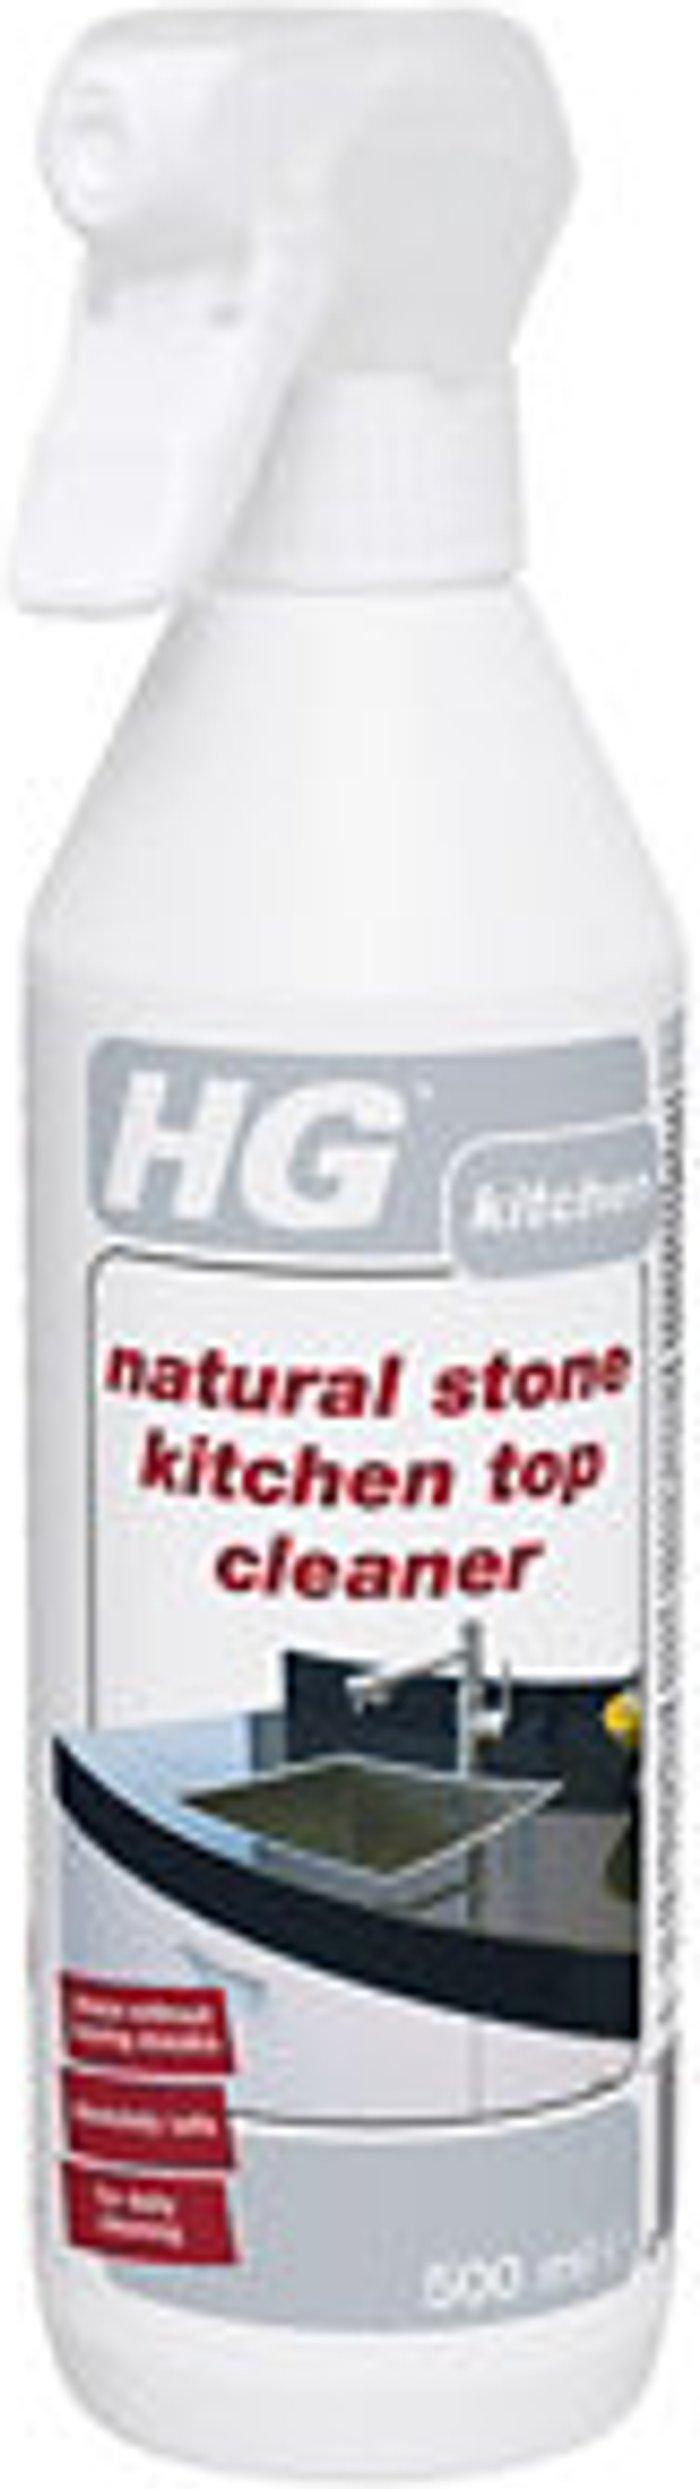 HG HG Worktop Stone cleaner  0.5L Bottle